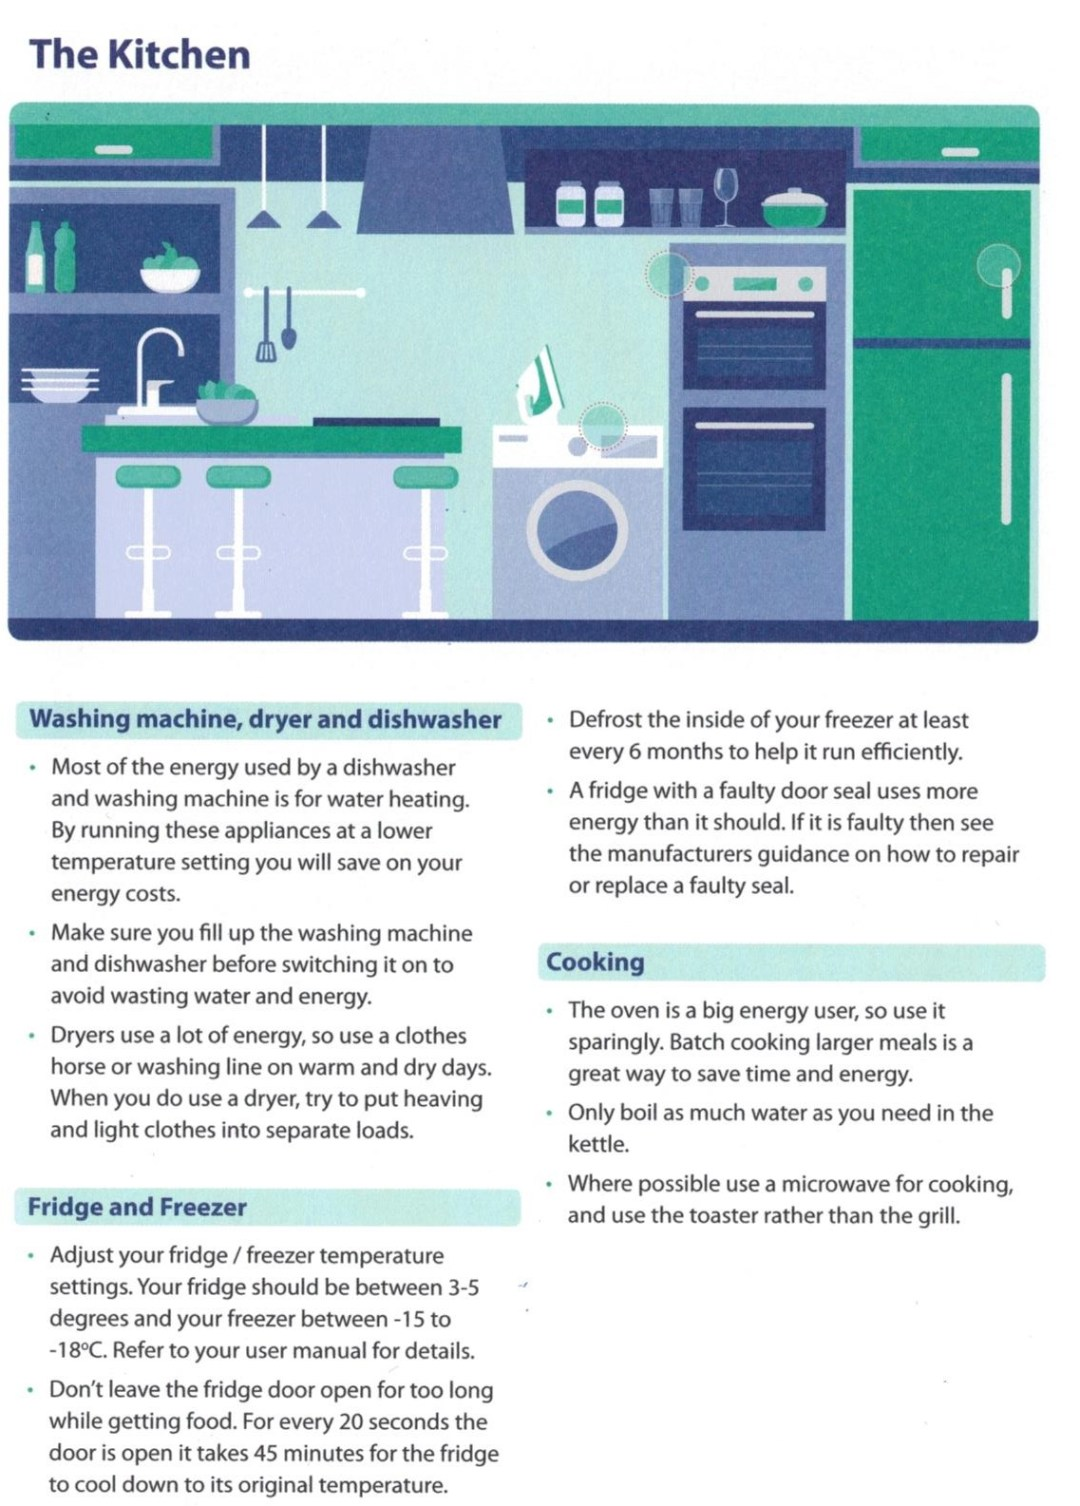 SEAI leaflet+kitchen